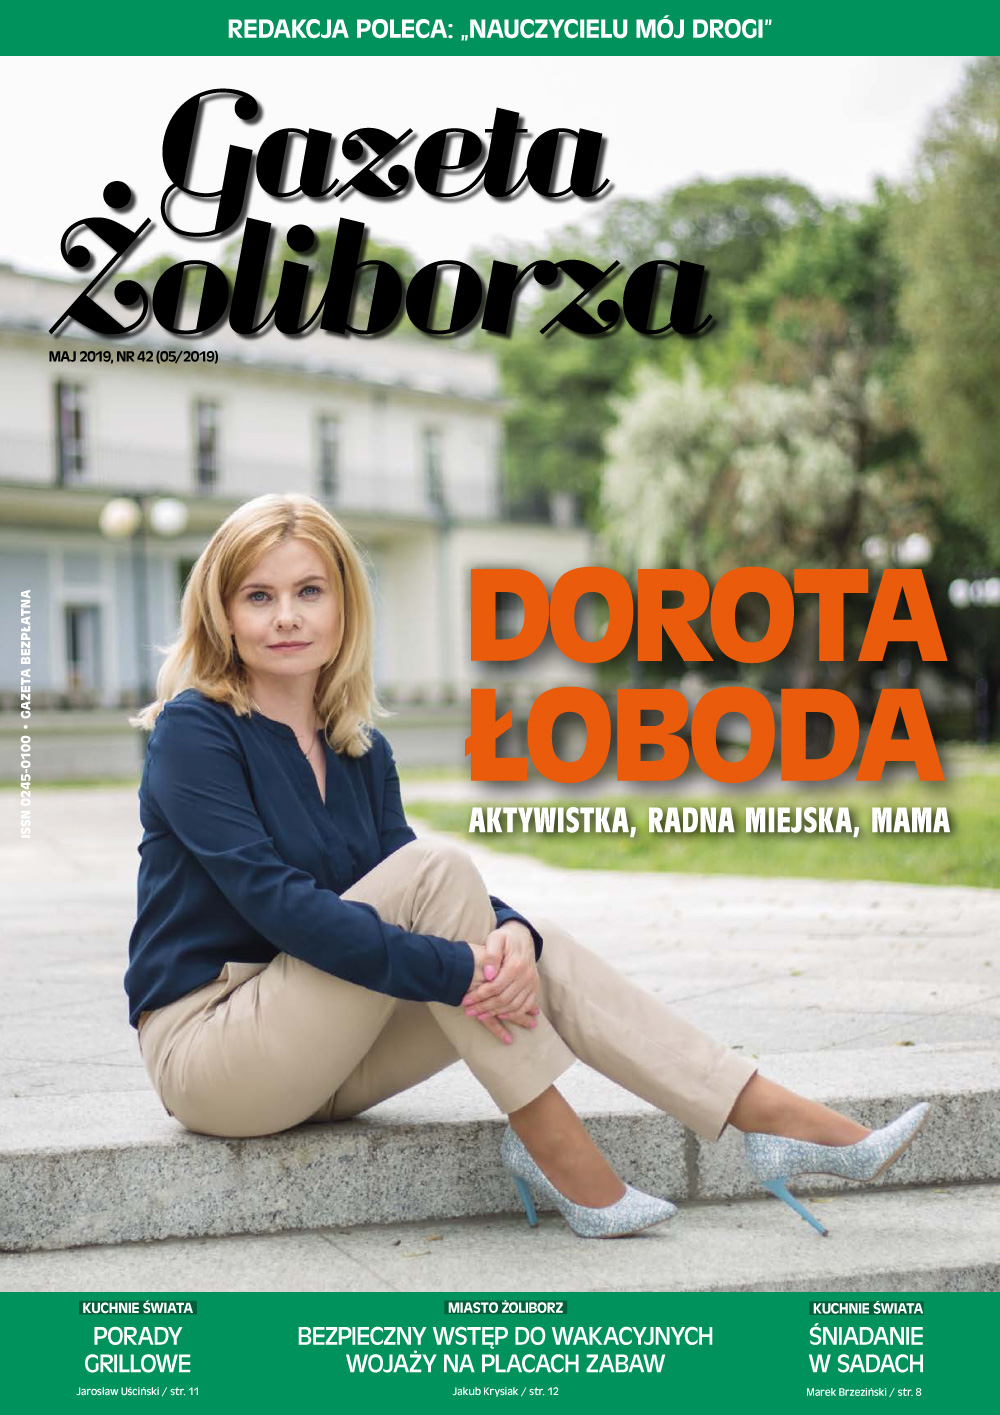 Gazeta Żoliborza - 05/2019 (38)